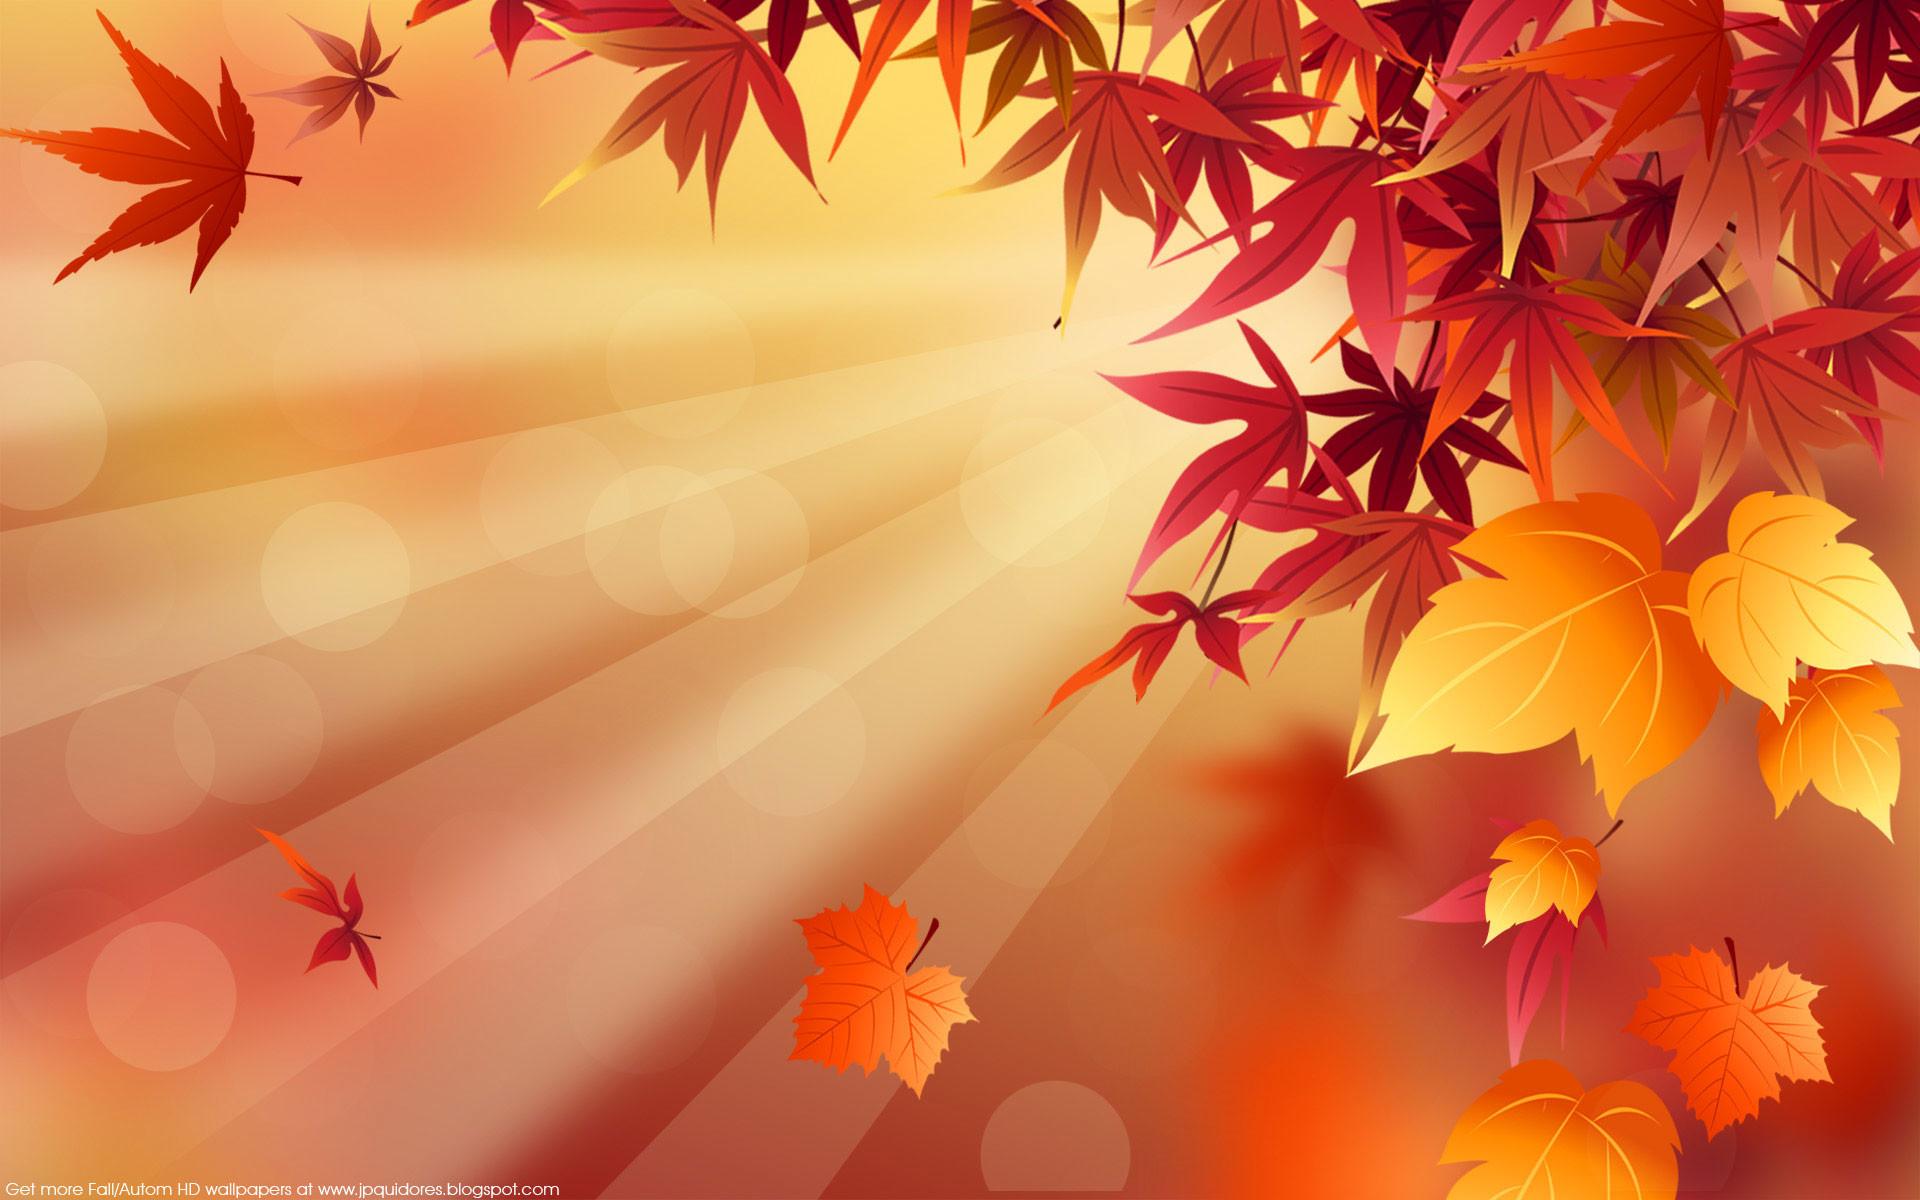 Fall Desktop Backgrounds Hd